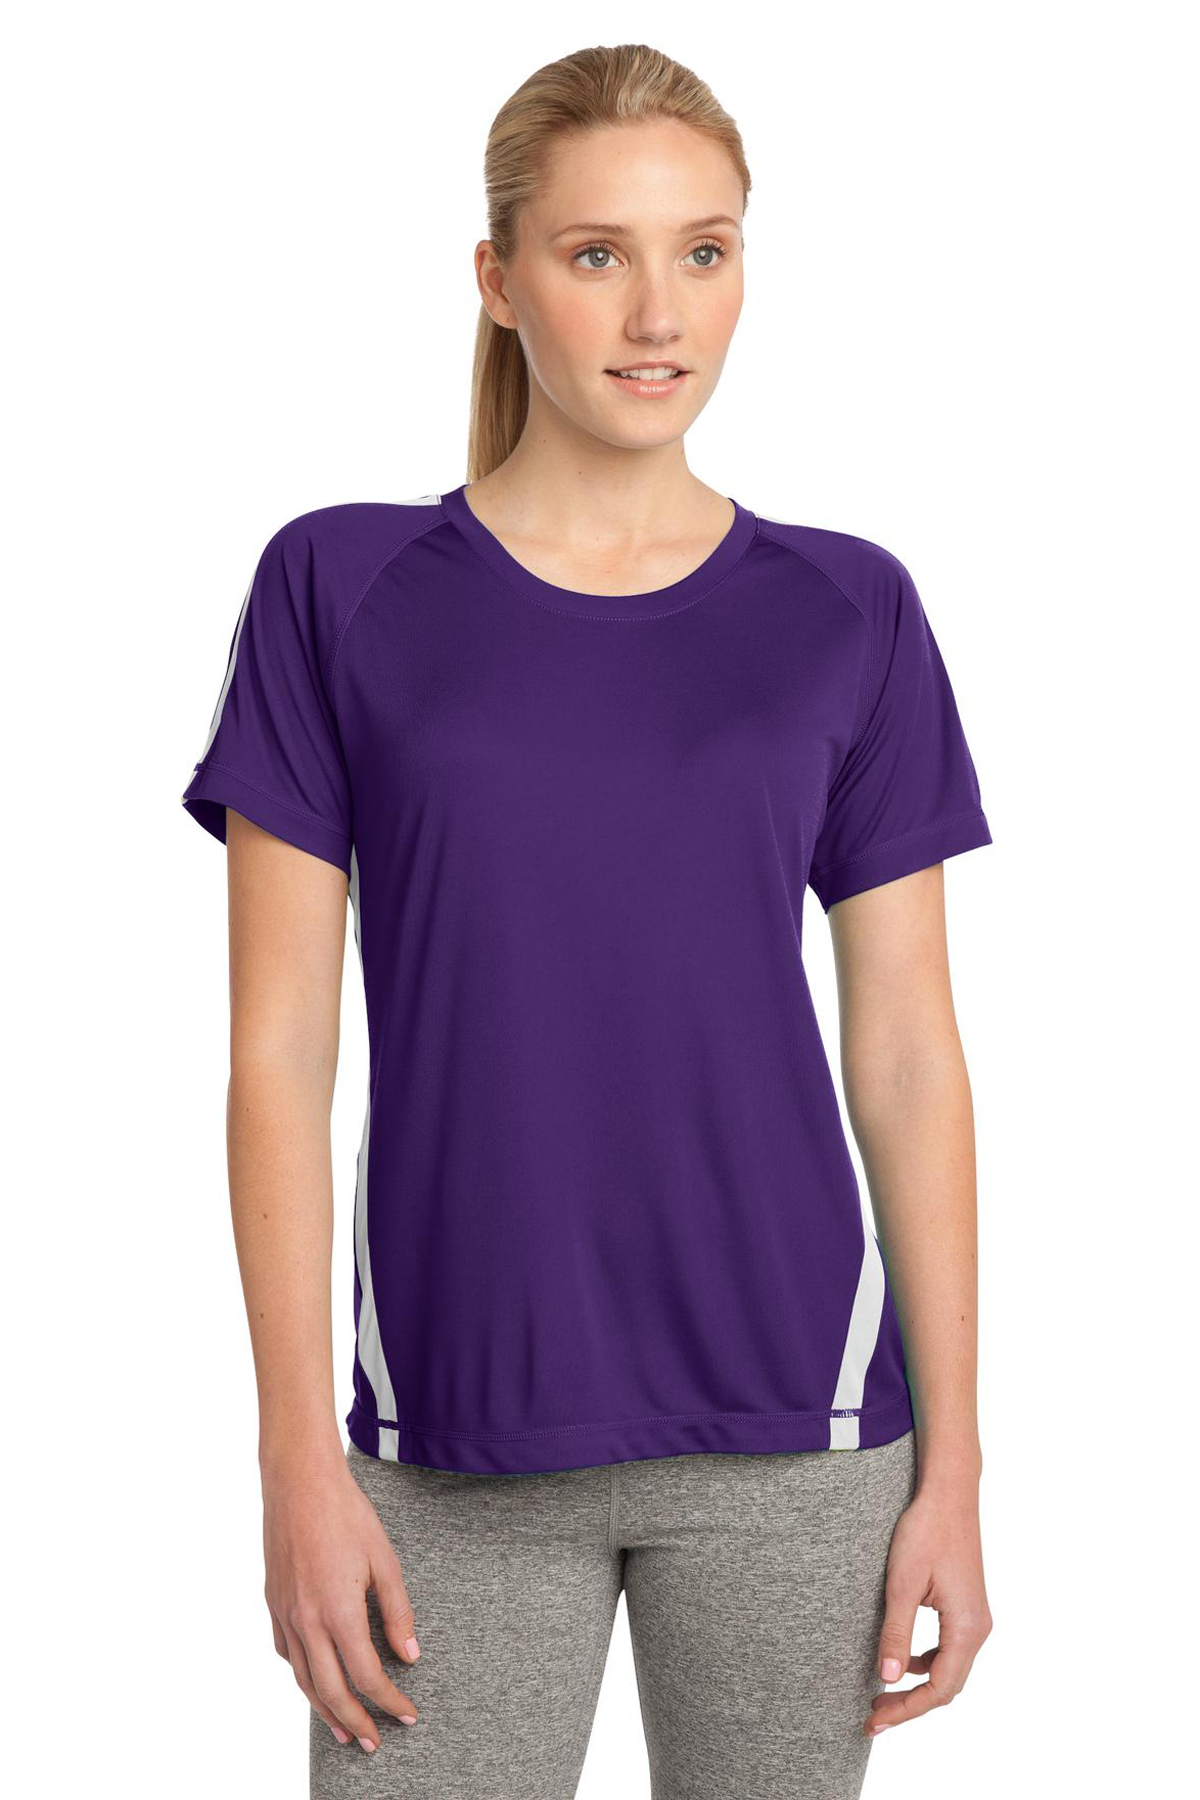 T-Shirts-Performance-13